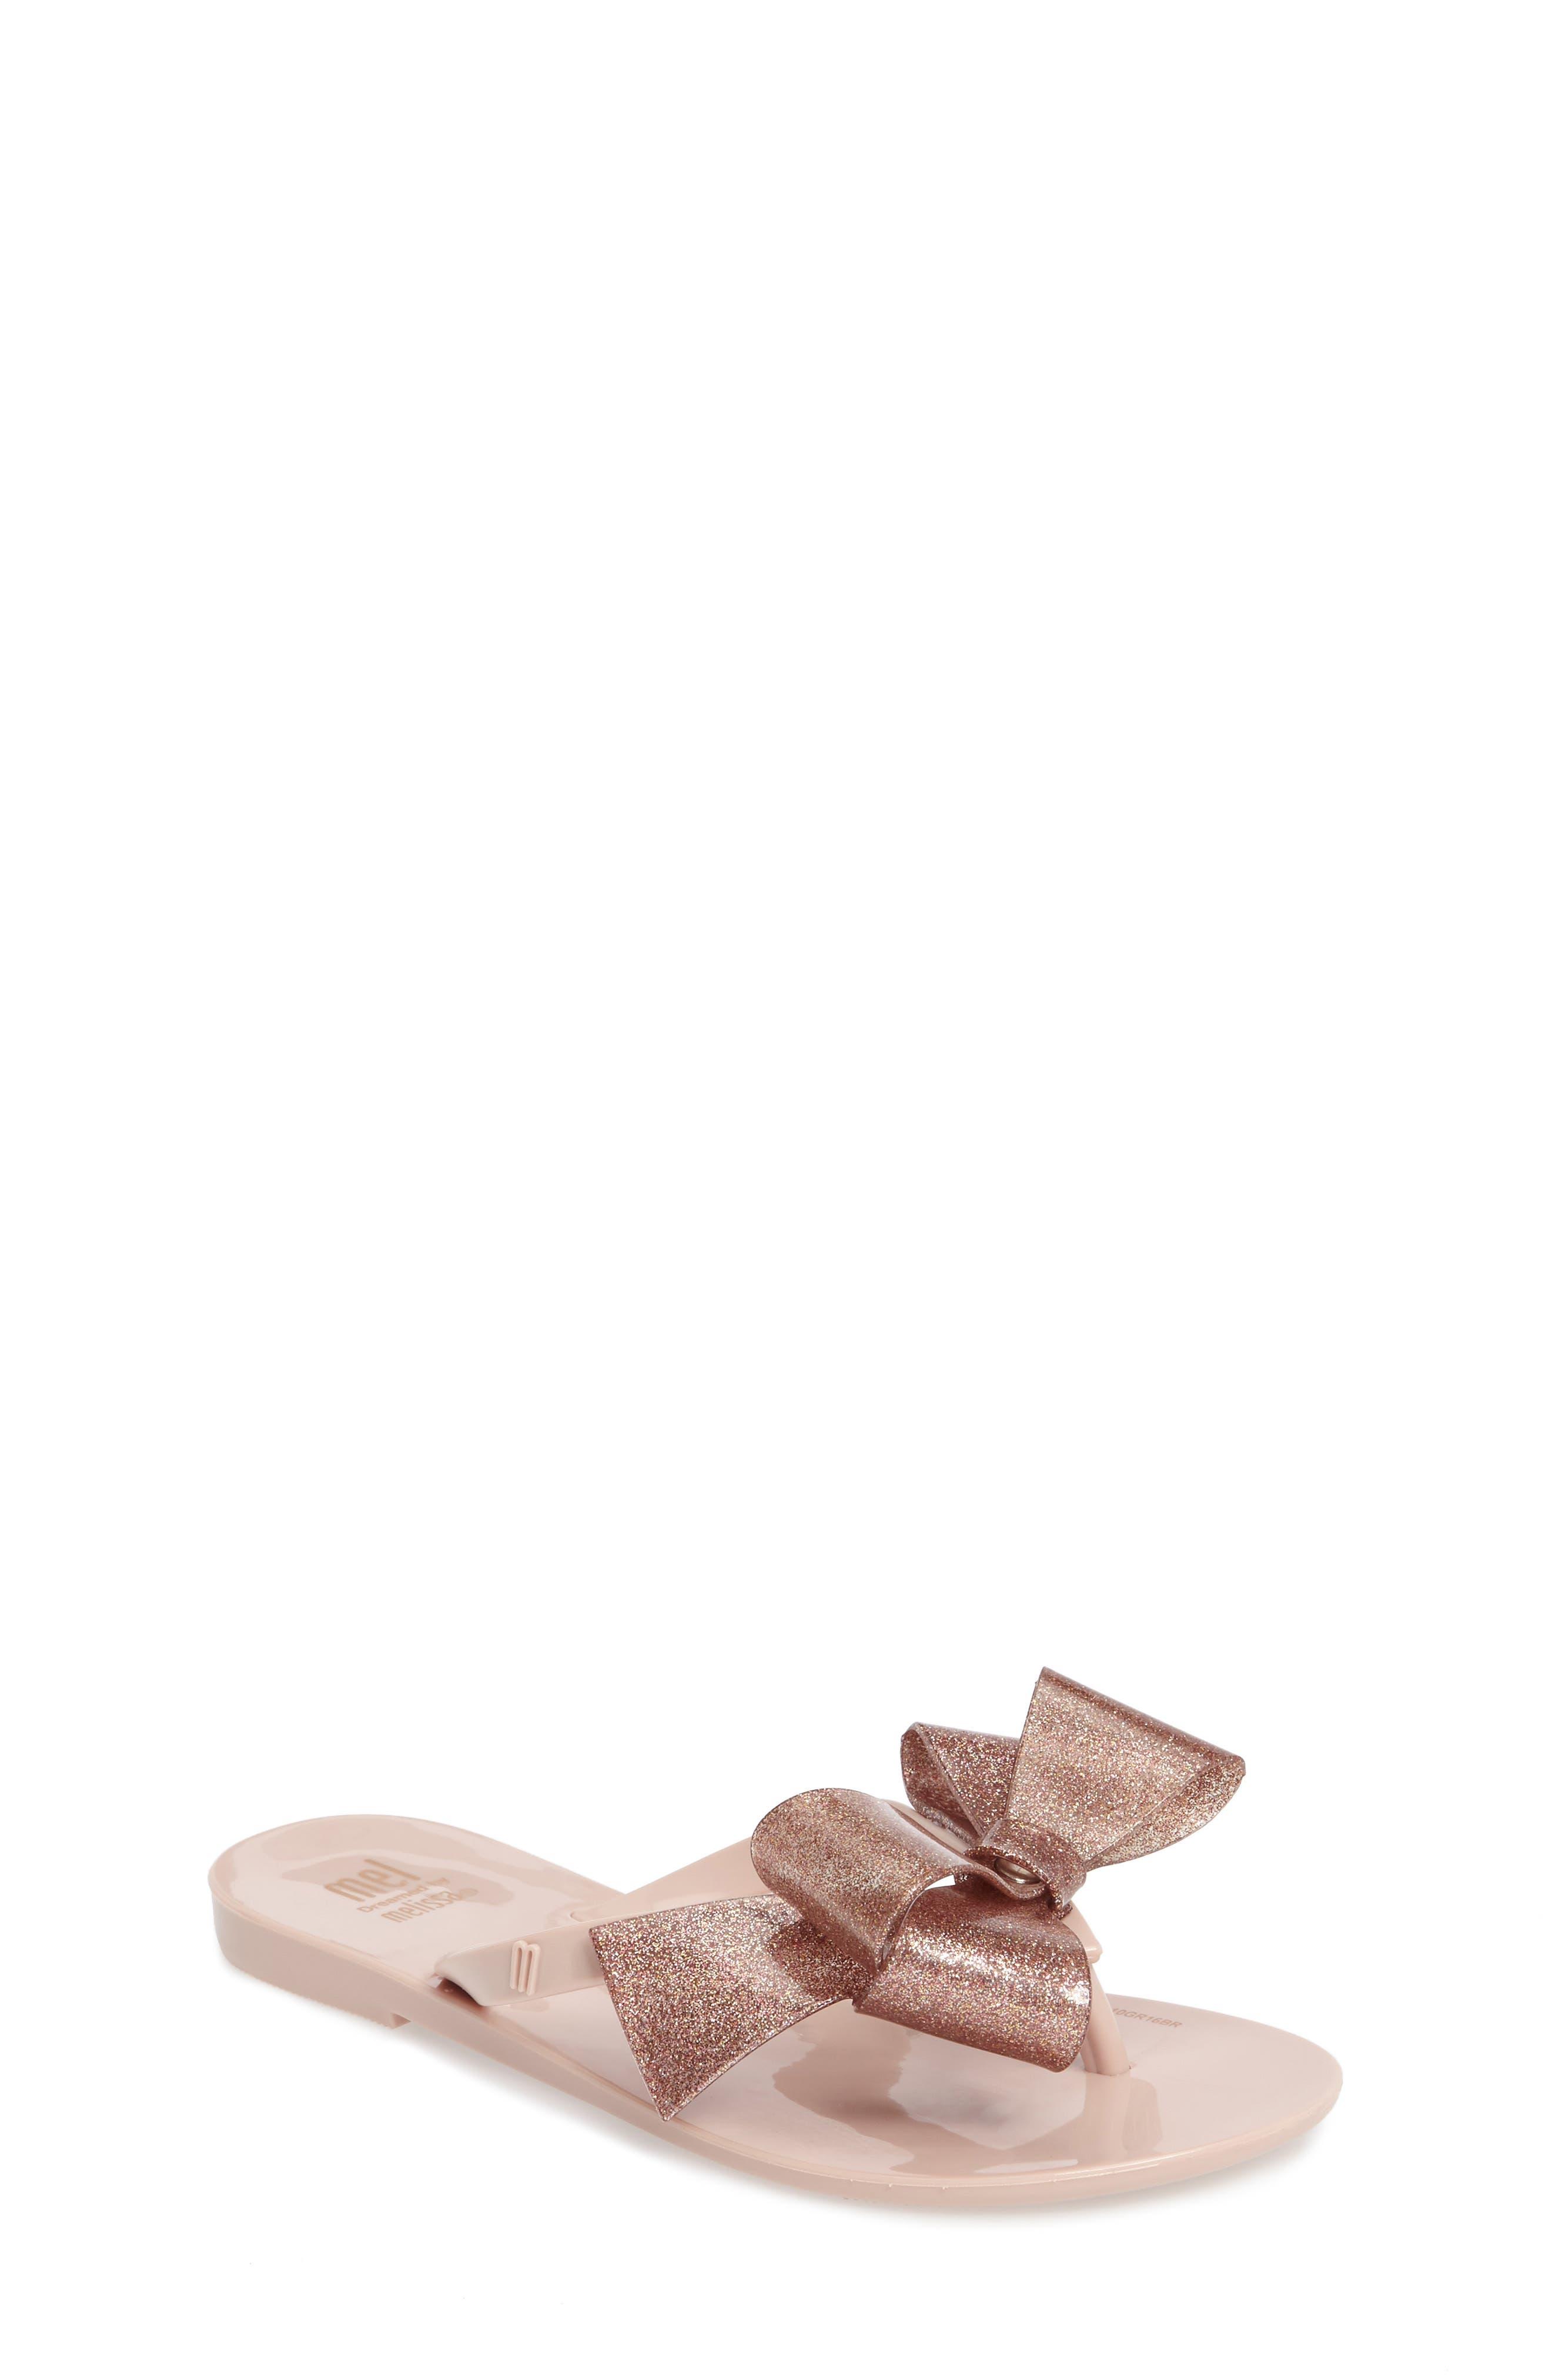 Harmonic Bow III Sandal,                             Main thumbnail 1, color,                             SAND